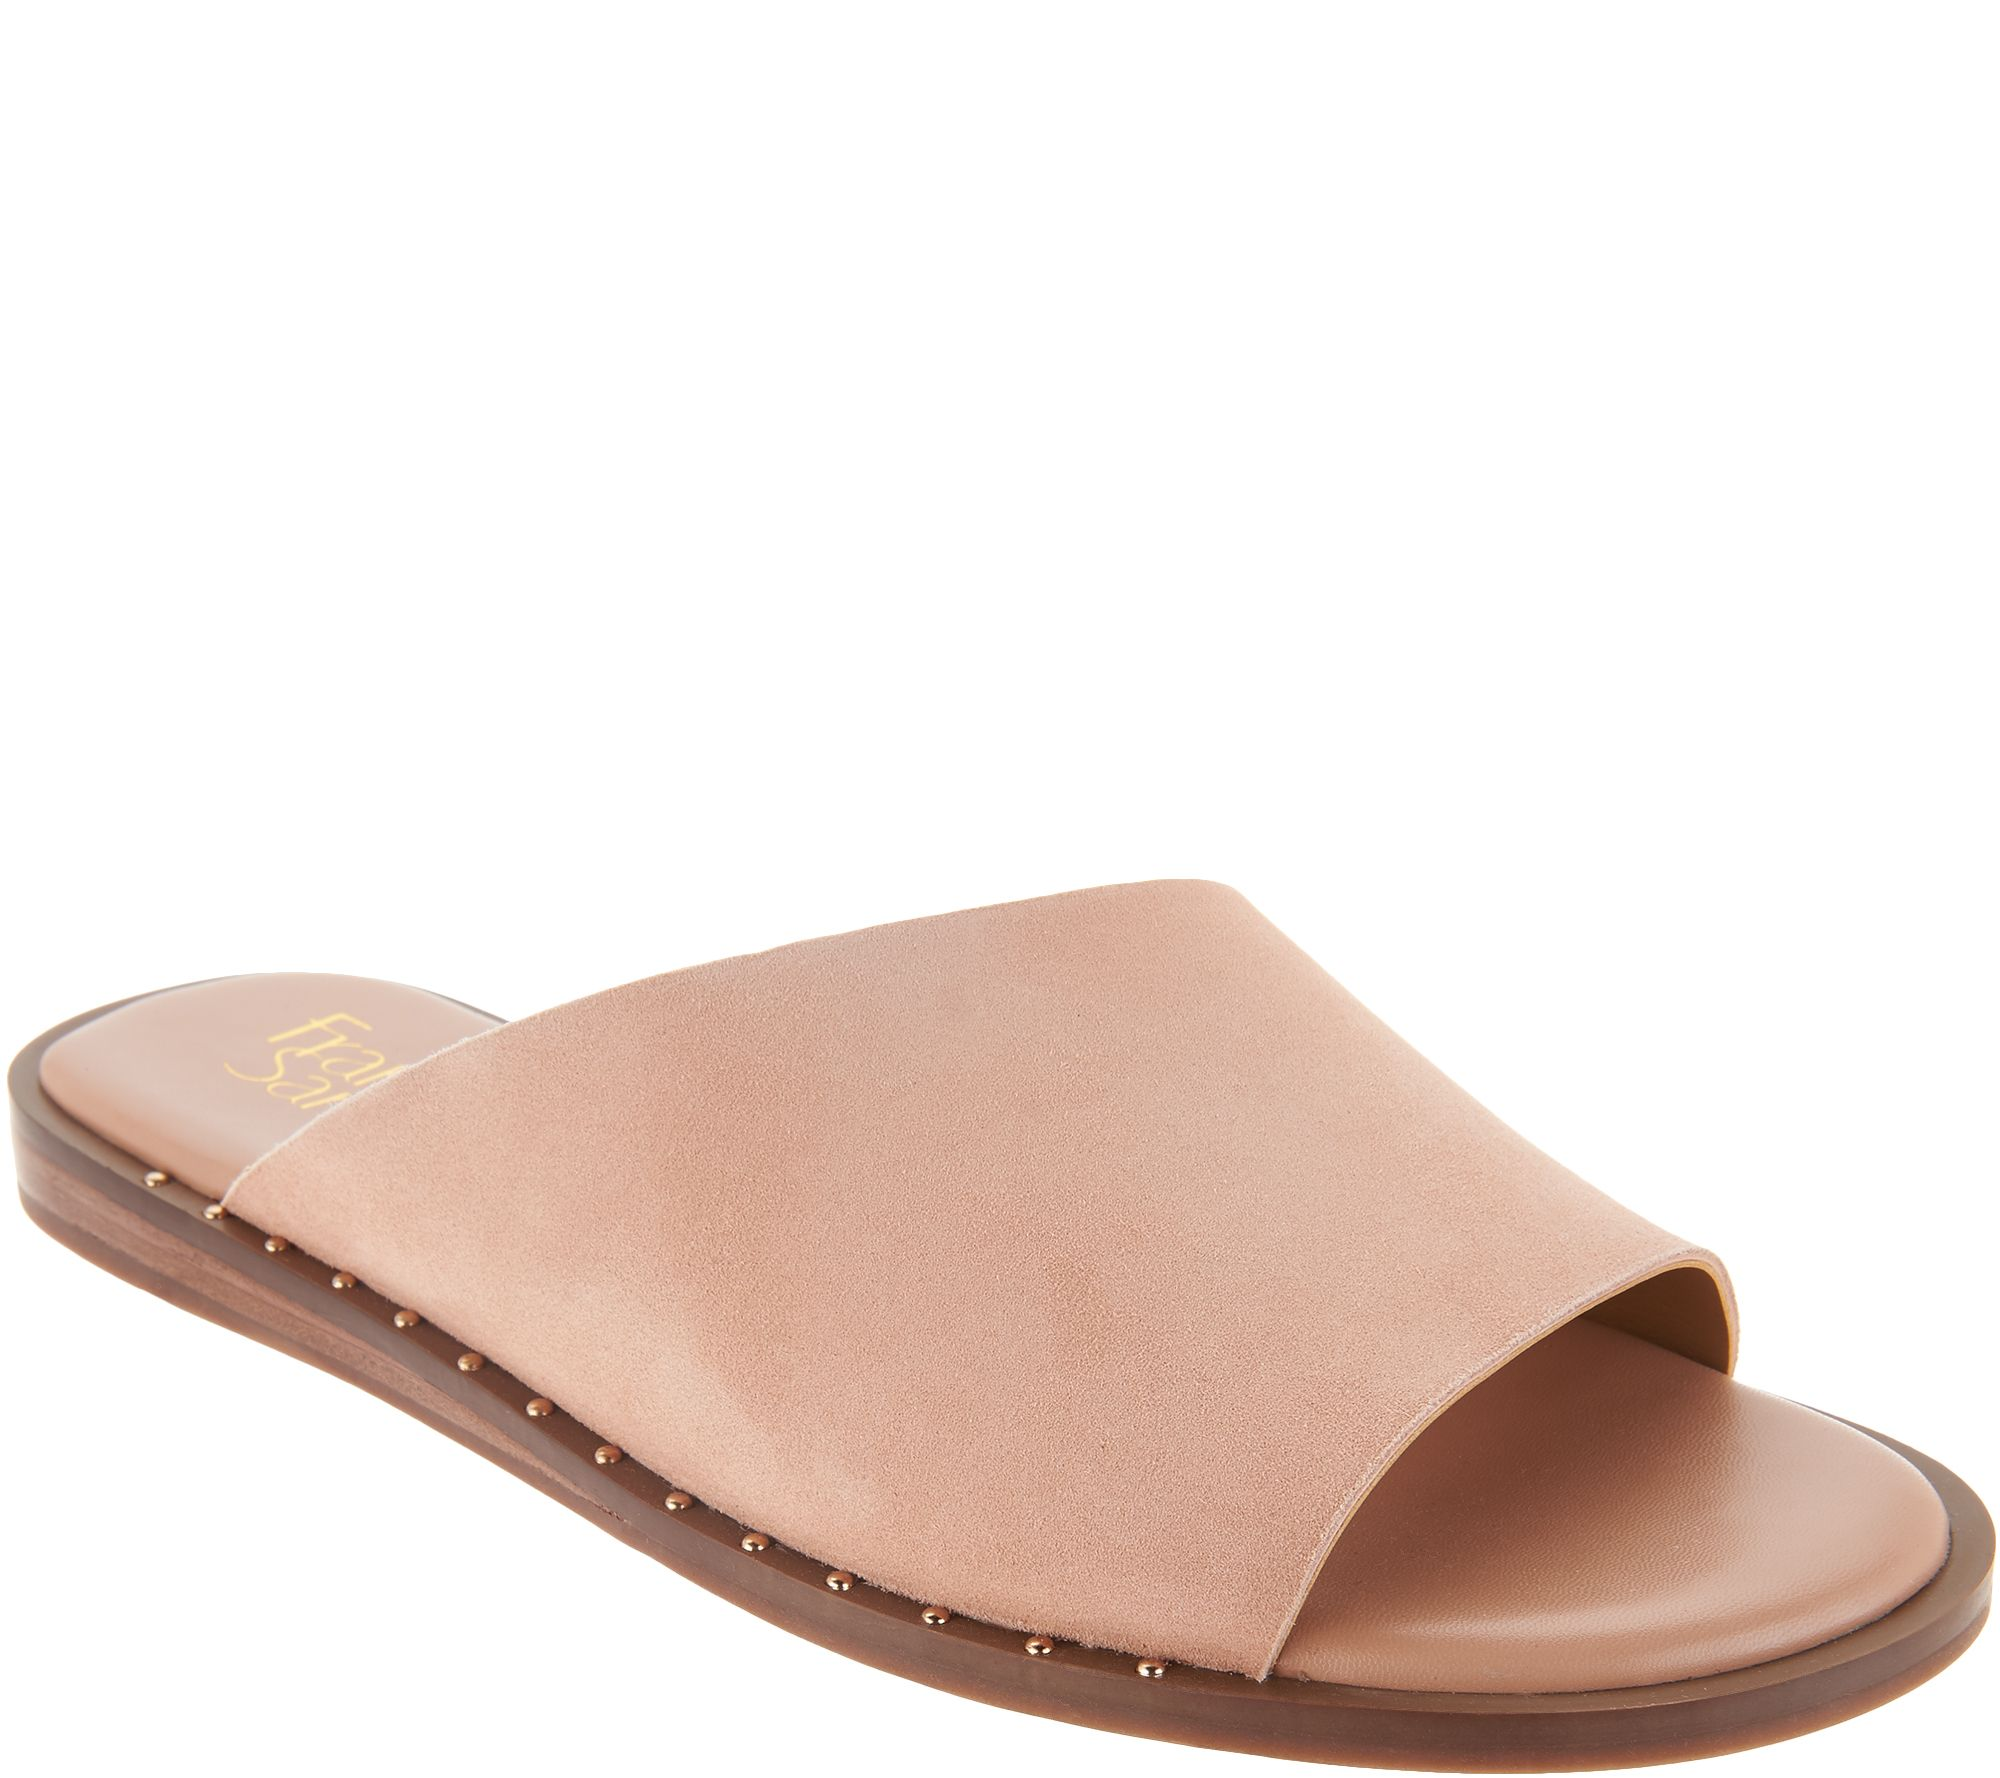 7c55dd0cbe1c Franco Sarto Leather Slide Sandals - Rye - Page 1 — QVC.com